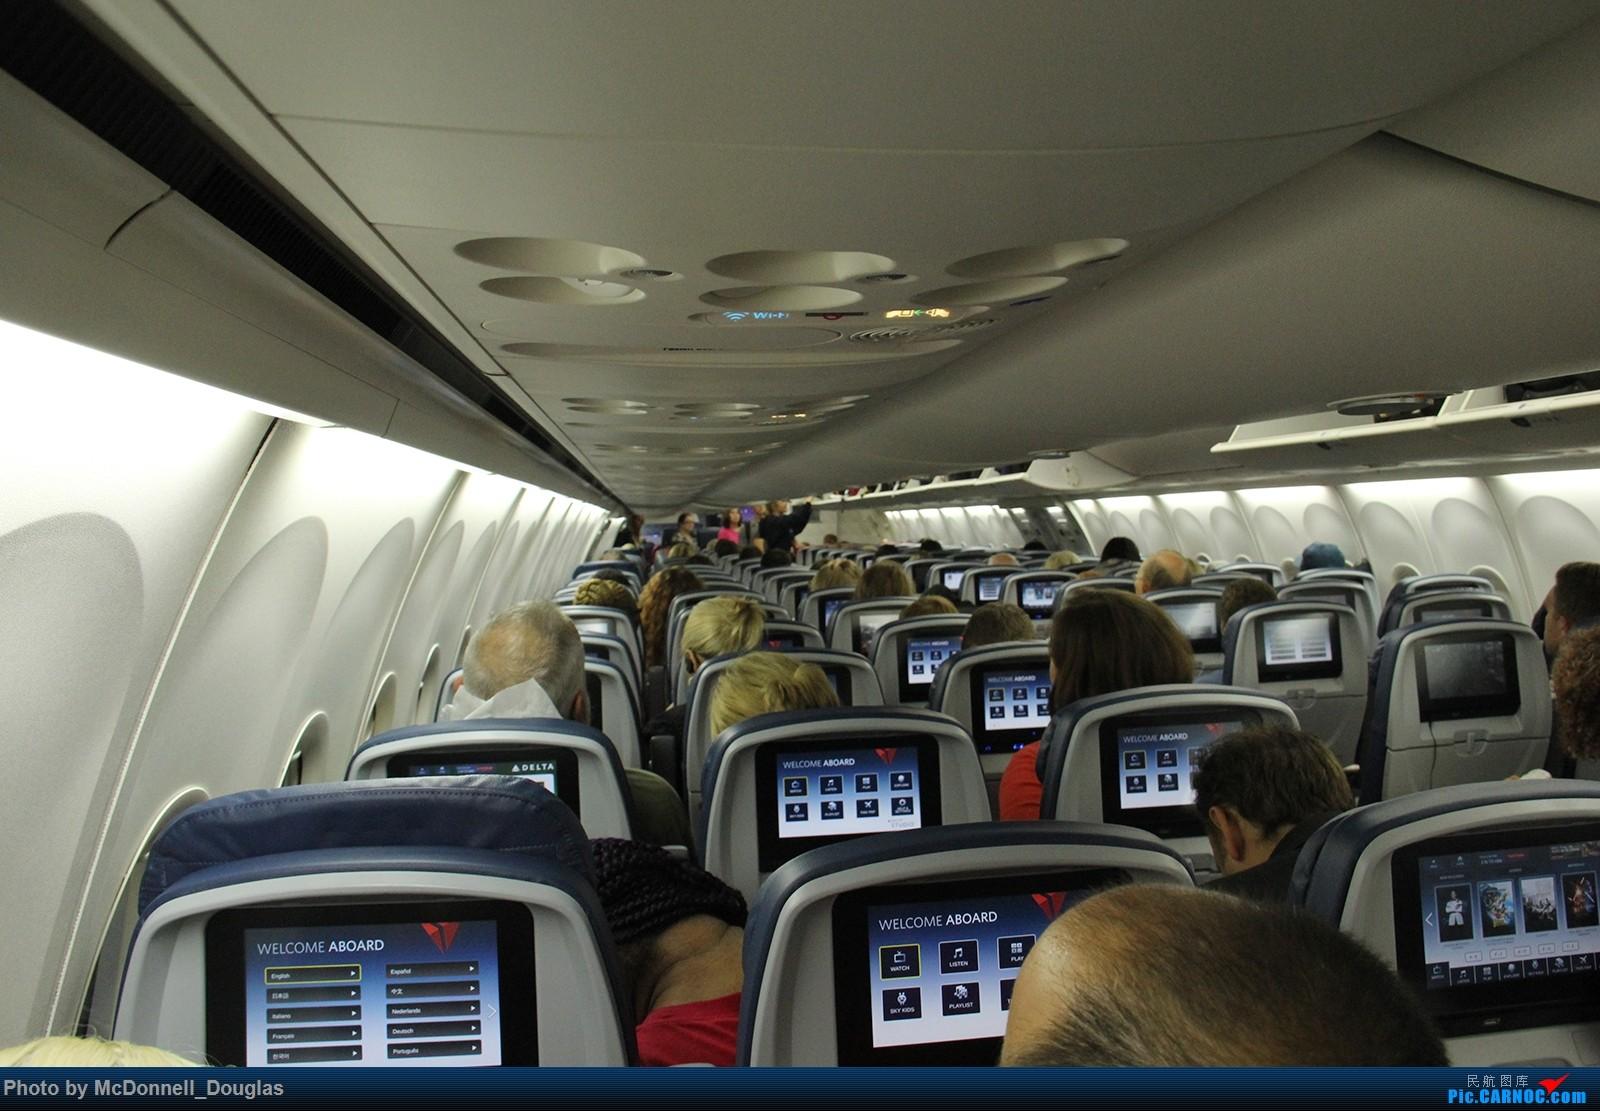 Re:[原创]【上海飞友会】图会很多,也有很多驾驶舱,杂七杂八的美帝,梦寐以求的圣马丁,这更绝不弃贴【驾驶舱已出现】 BOEING757-232 N6702 美国明尼阿波利斯—圣保罗机场